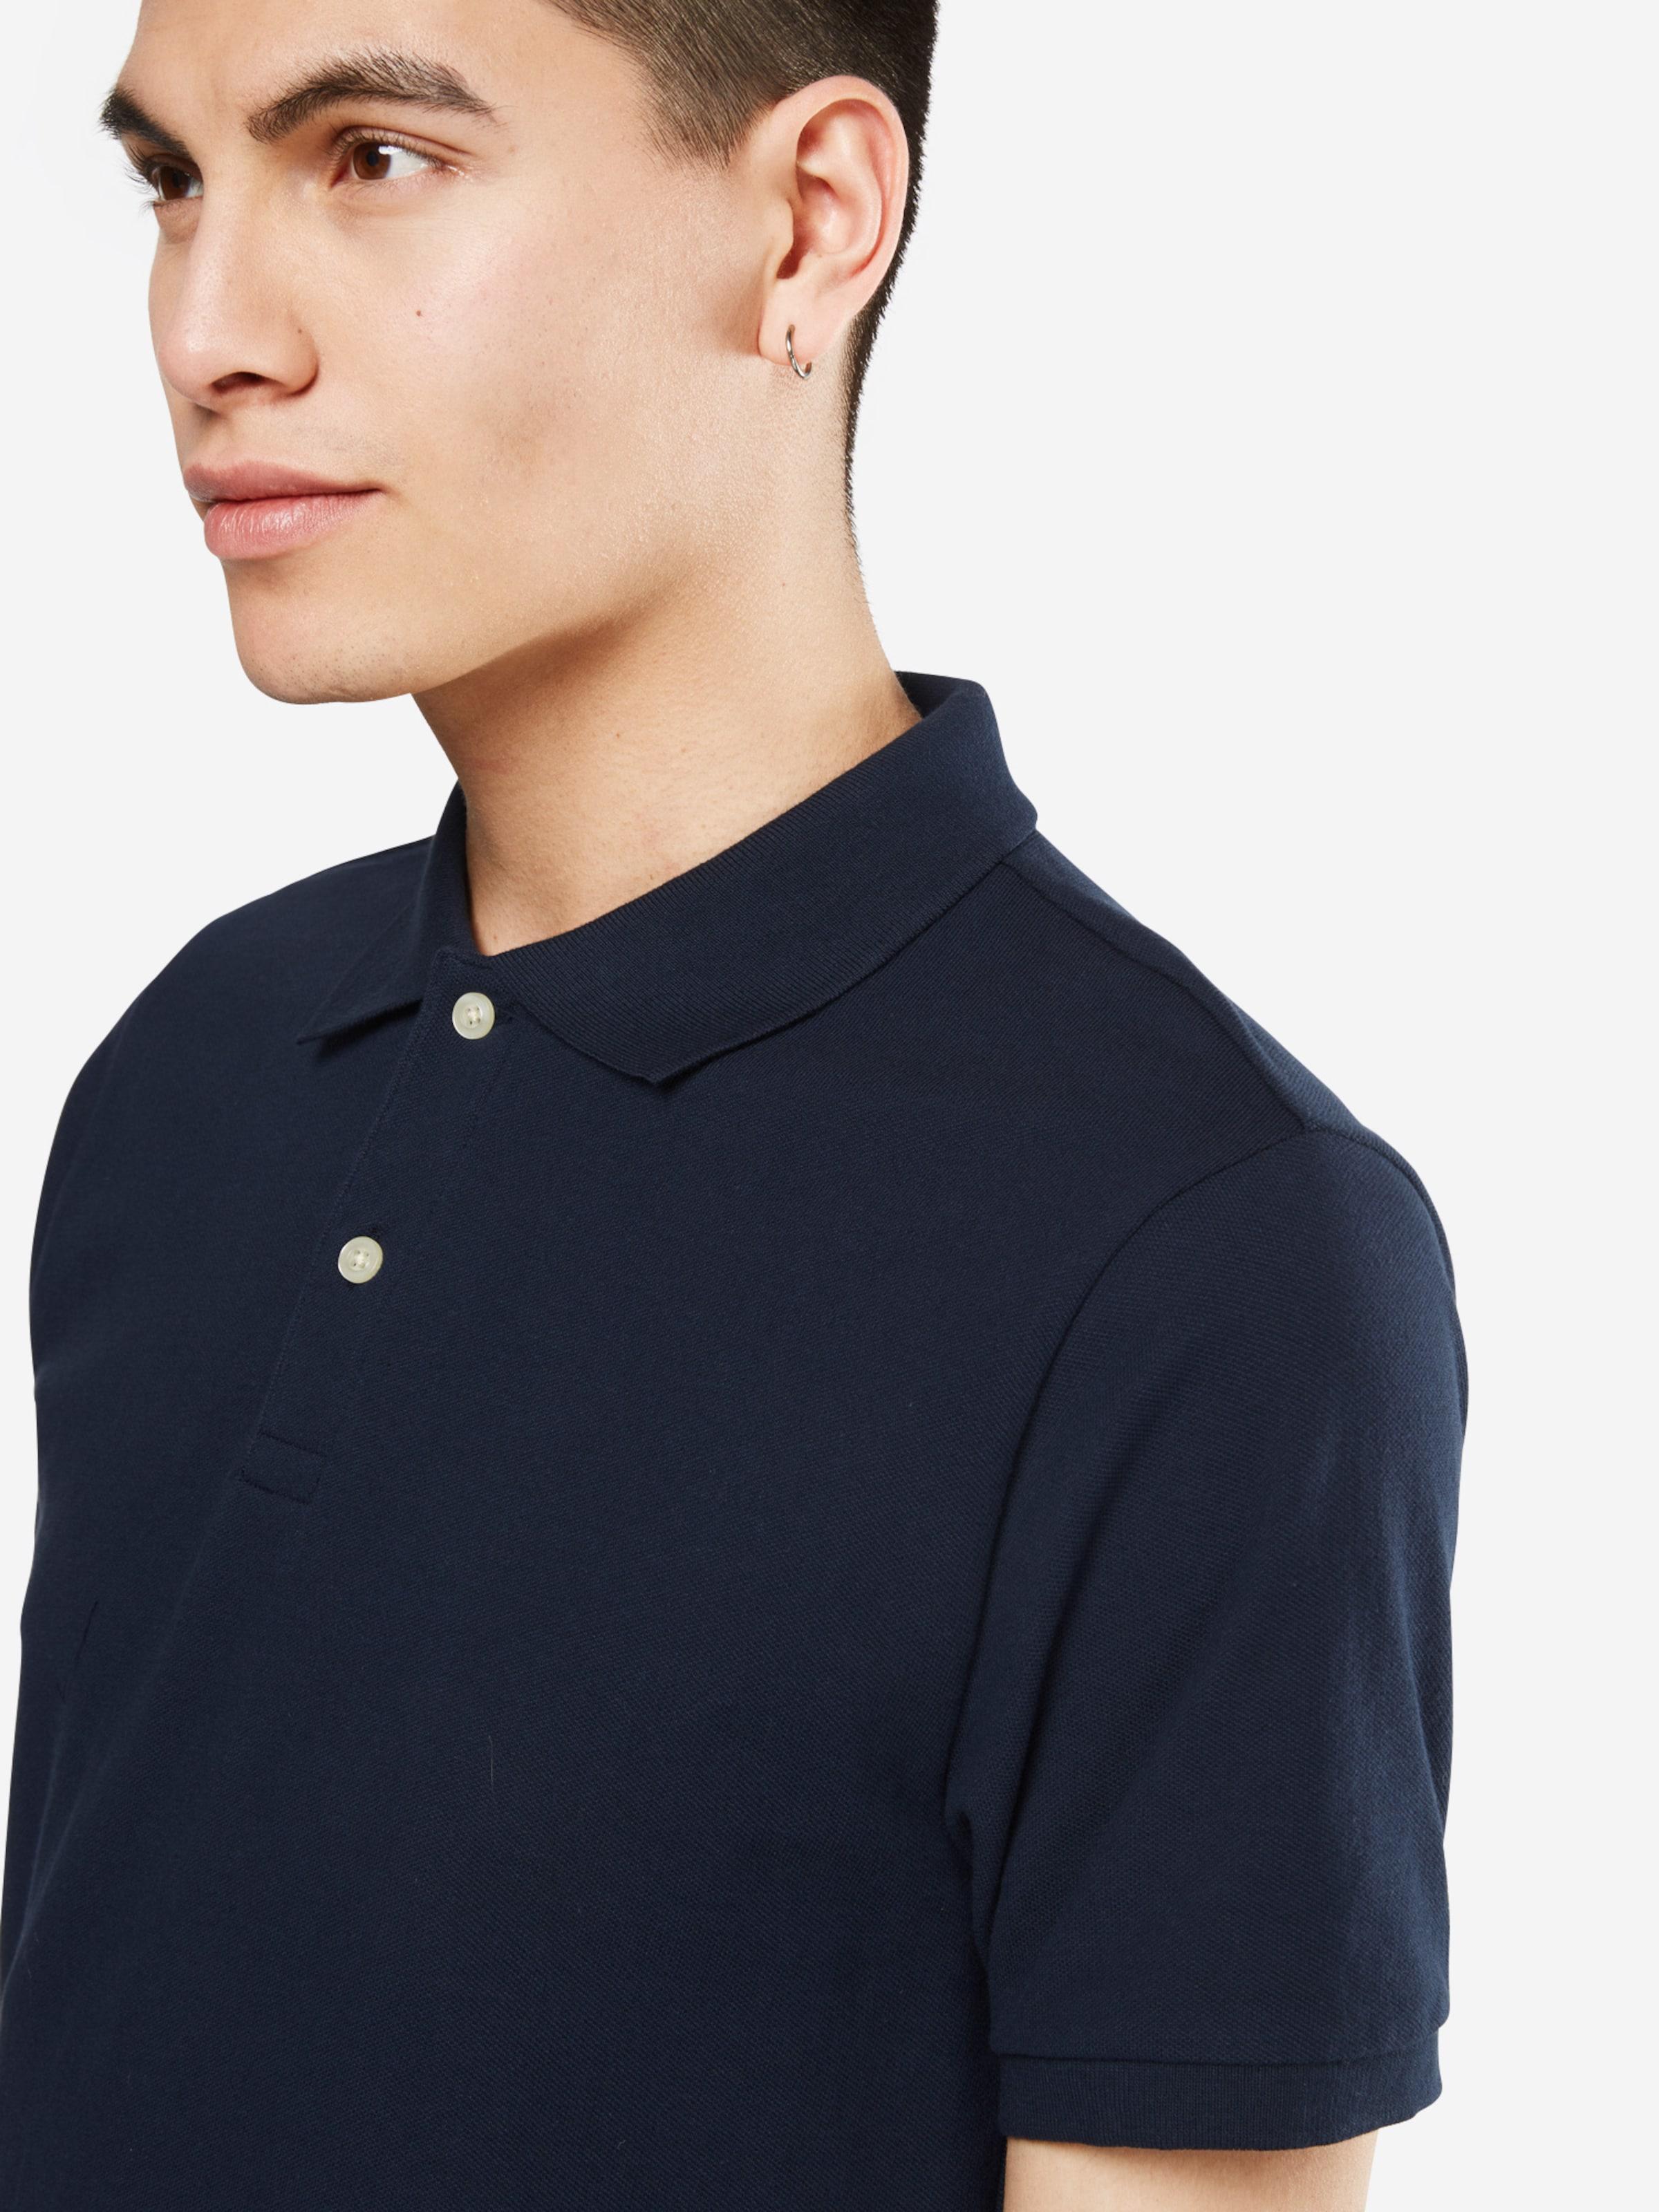 Blanc shirt En basic T Gap Pique' 'v yPN8nwm0vO